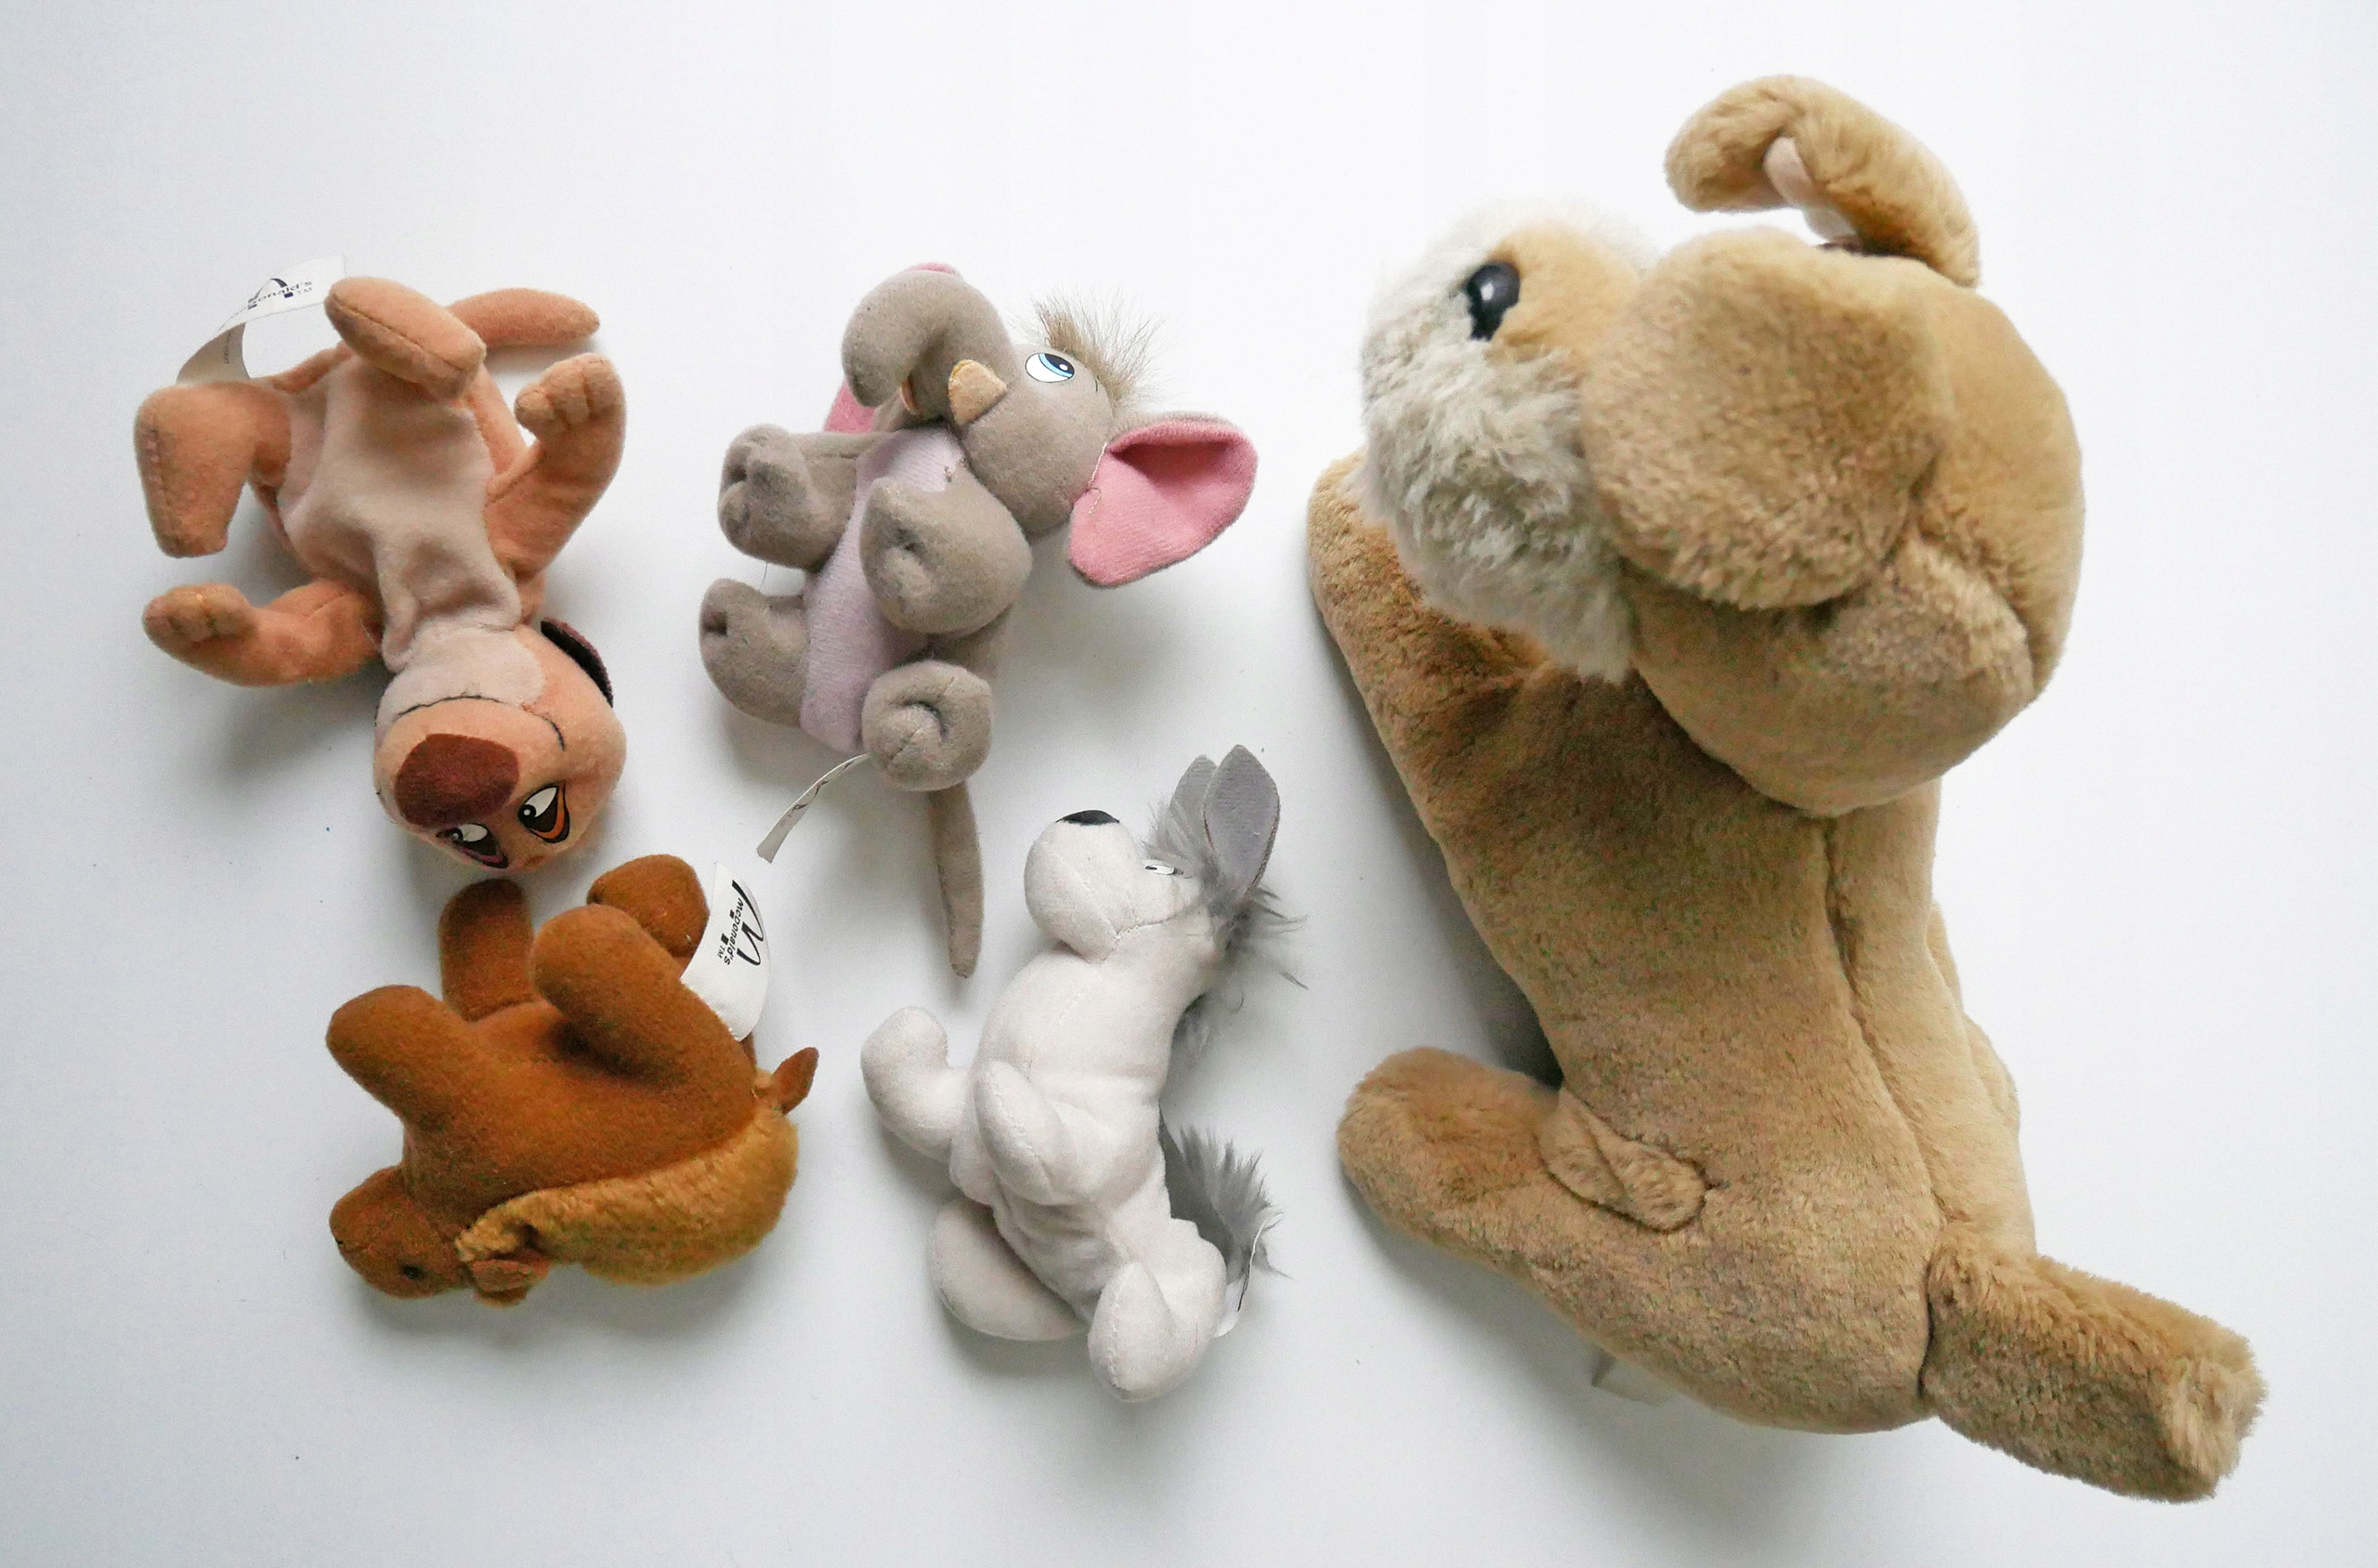 Pluszaki pieski wielbłąd Timon stan idealny+gratis